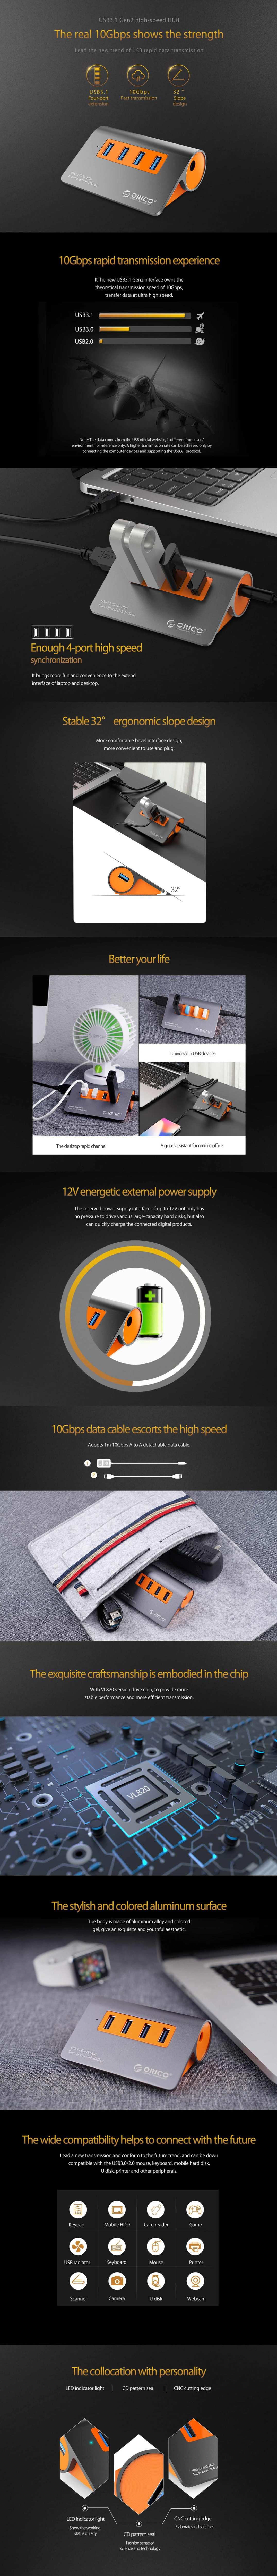 #1771---'ORICO-USB3_1-Gen2-10Gbps-High-speed-aluminum-alloy-HUB-(M3H4-G2)---ORICO'---www_orico_me.jpg